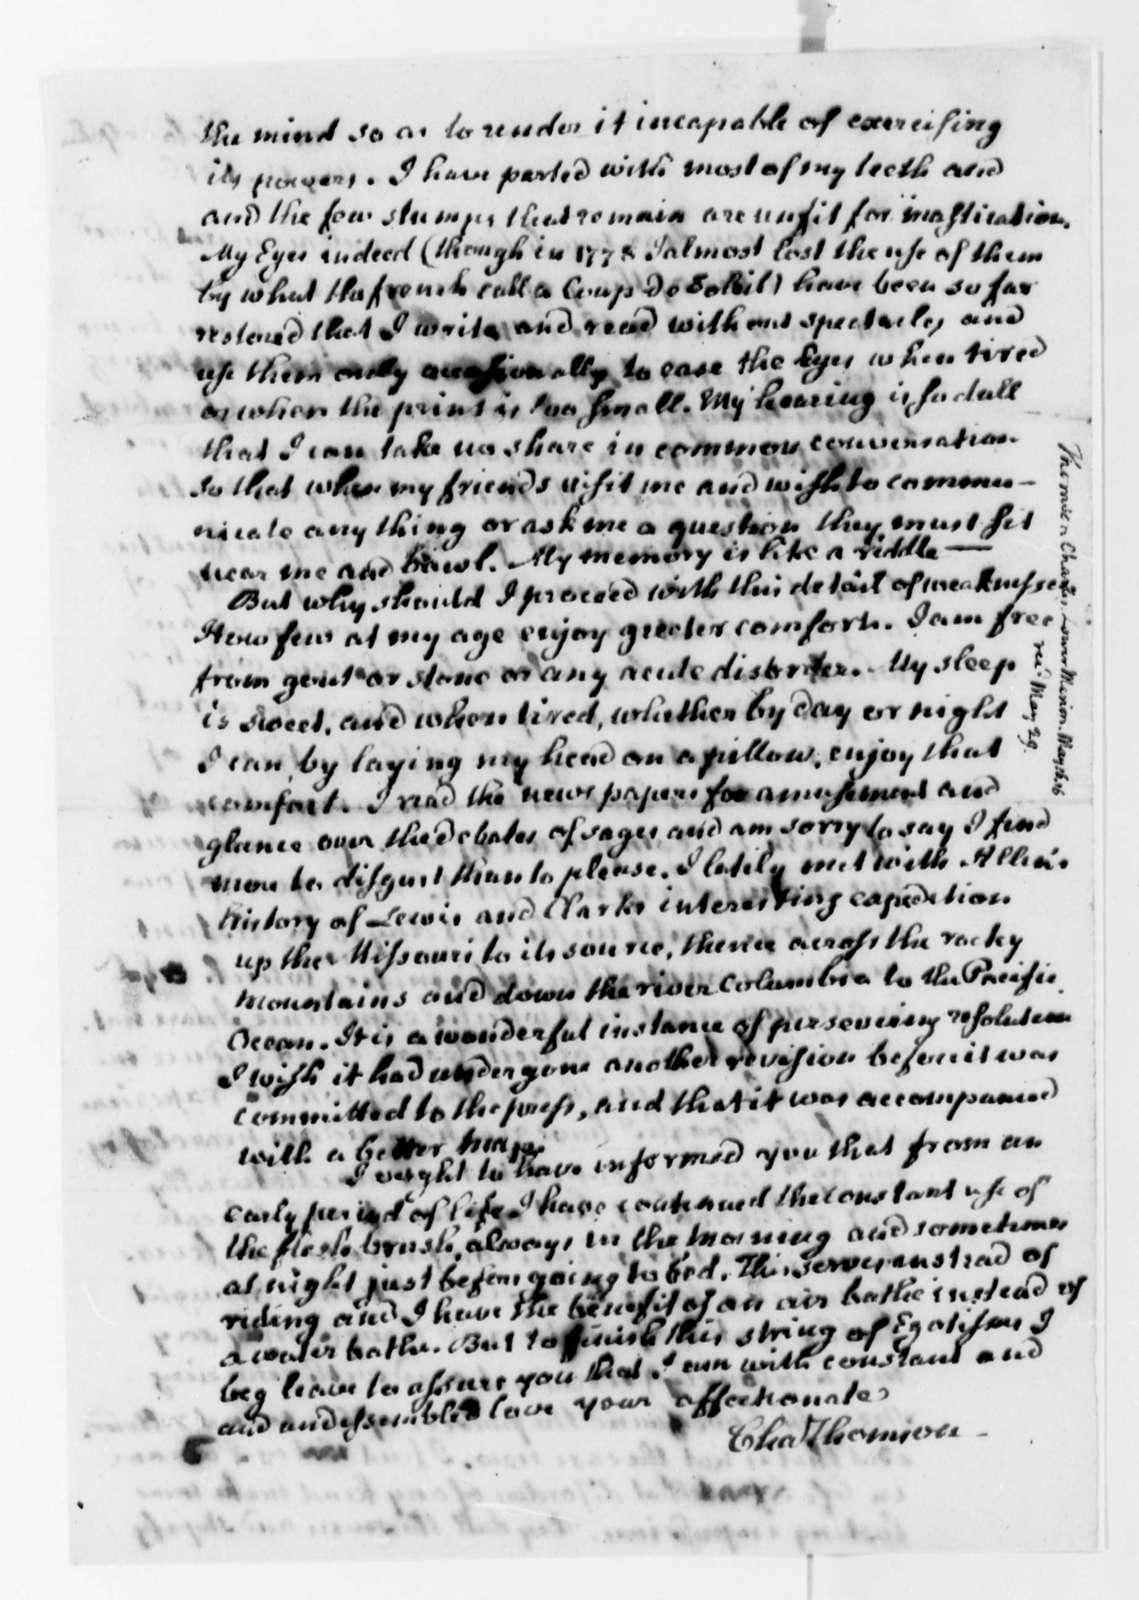 Charles Thomson to Thomas Jefferson, May 16, 1816